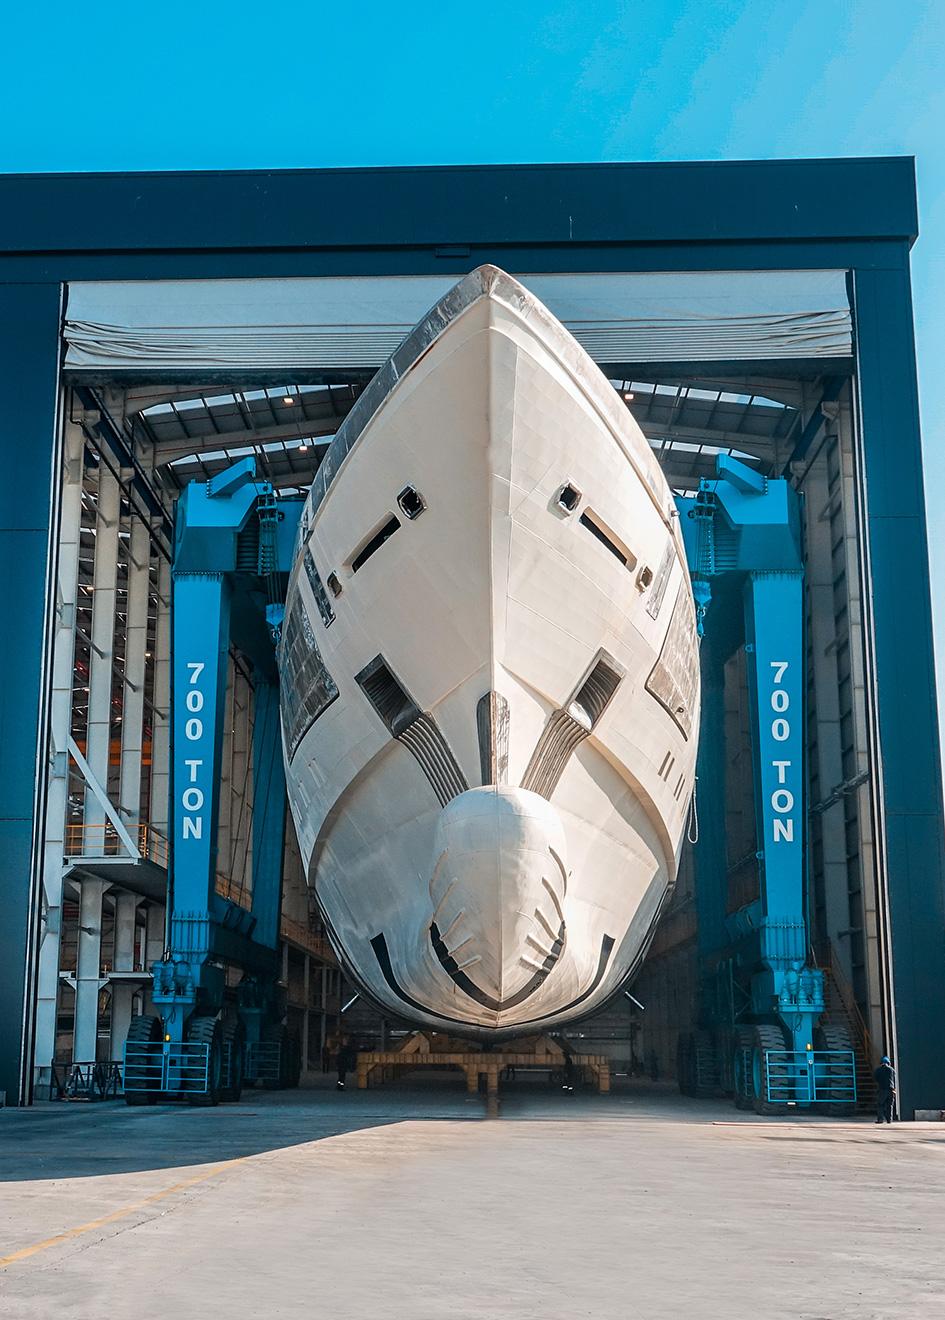 bow-view-of-the-bilgin-263-superyacht